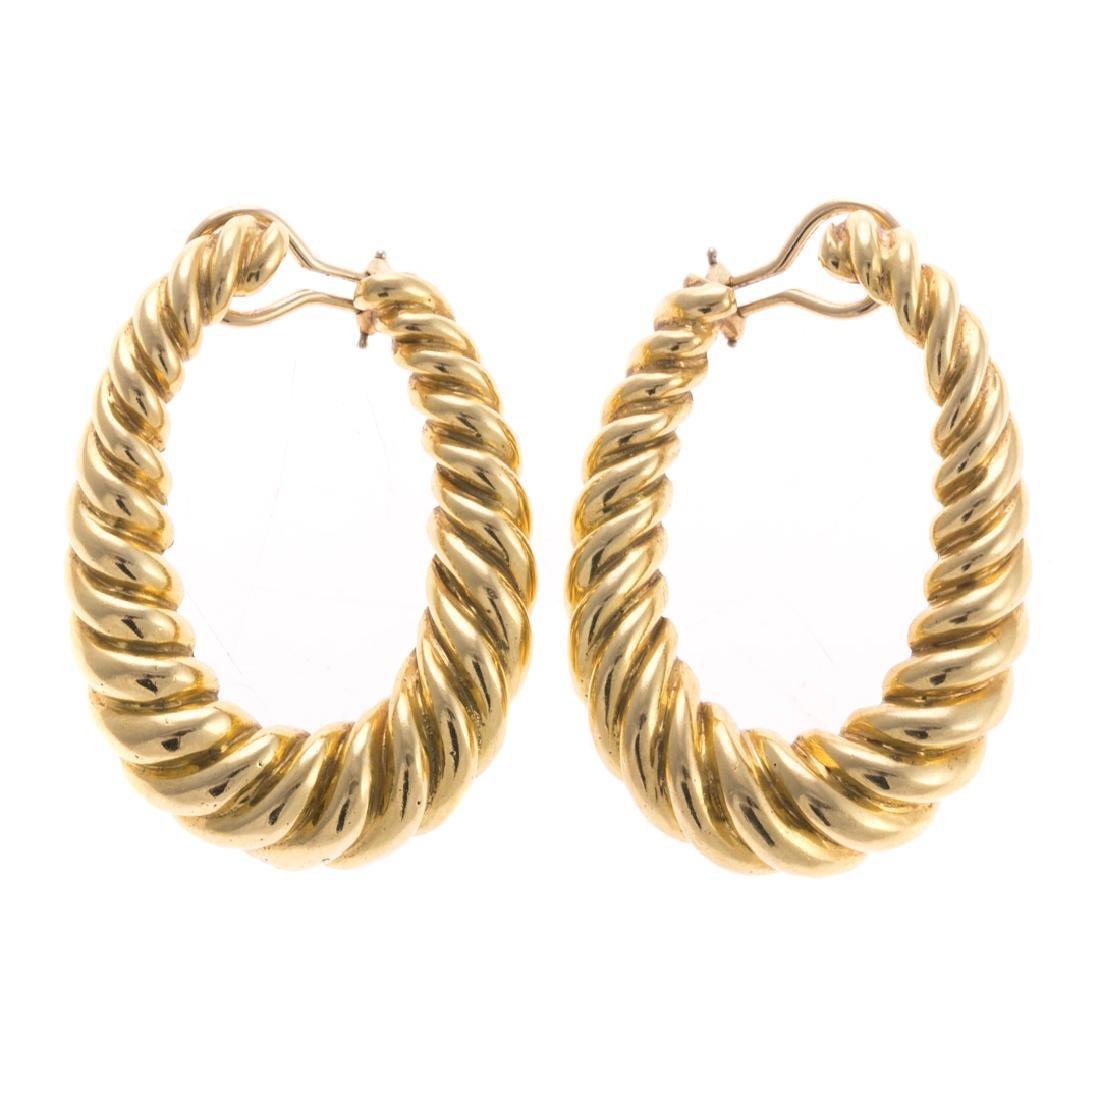 A Pair of Lady's Oval Rope Earrings in 18K